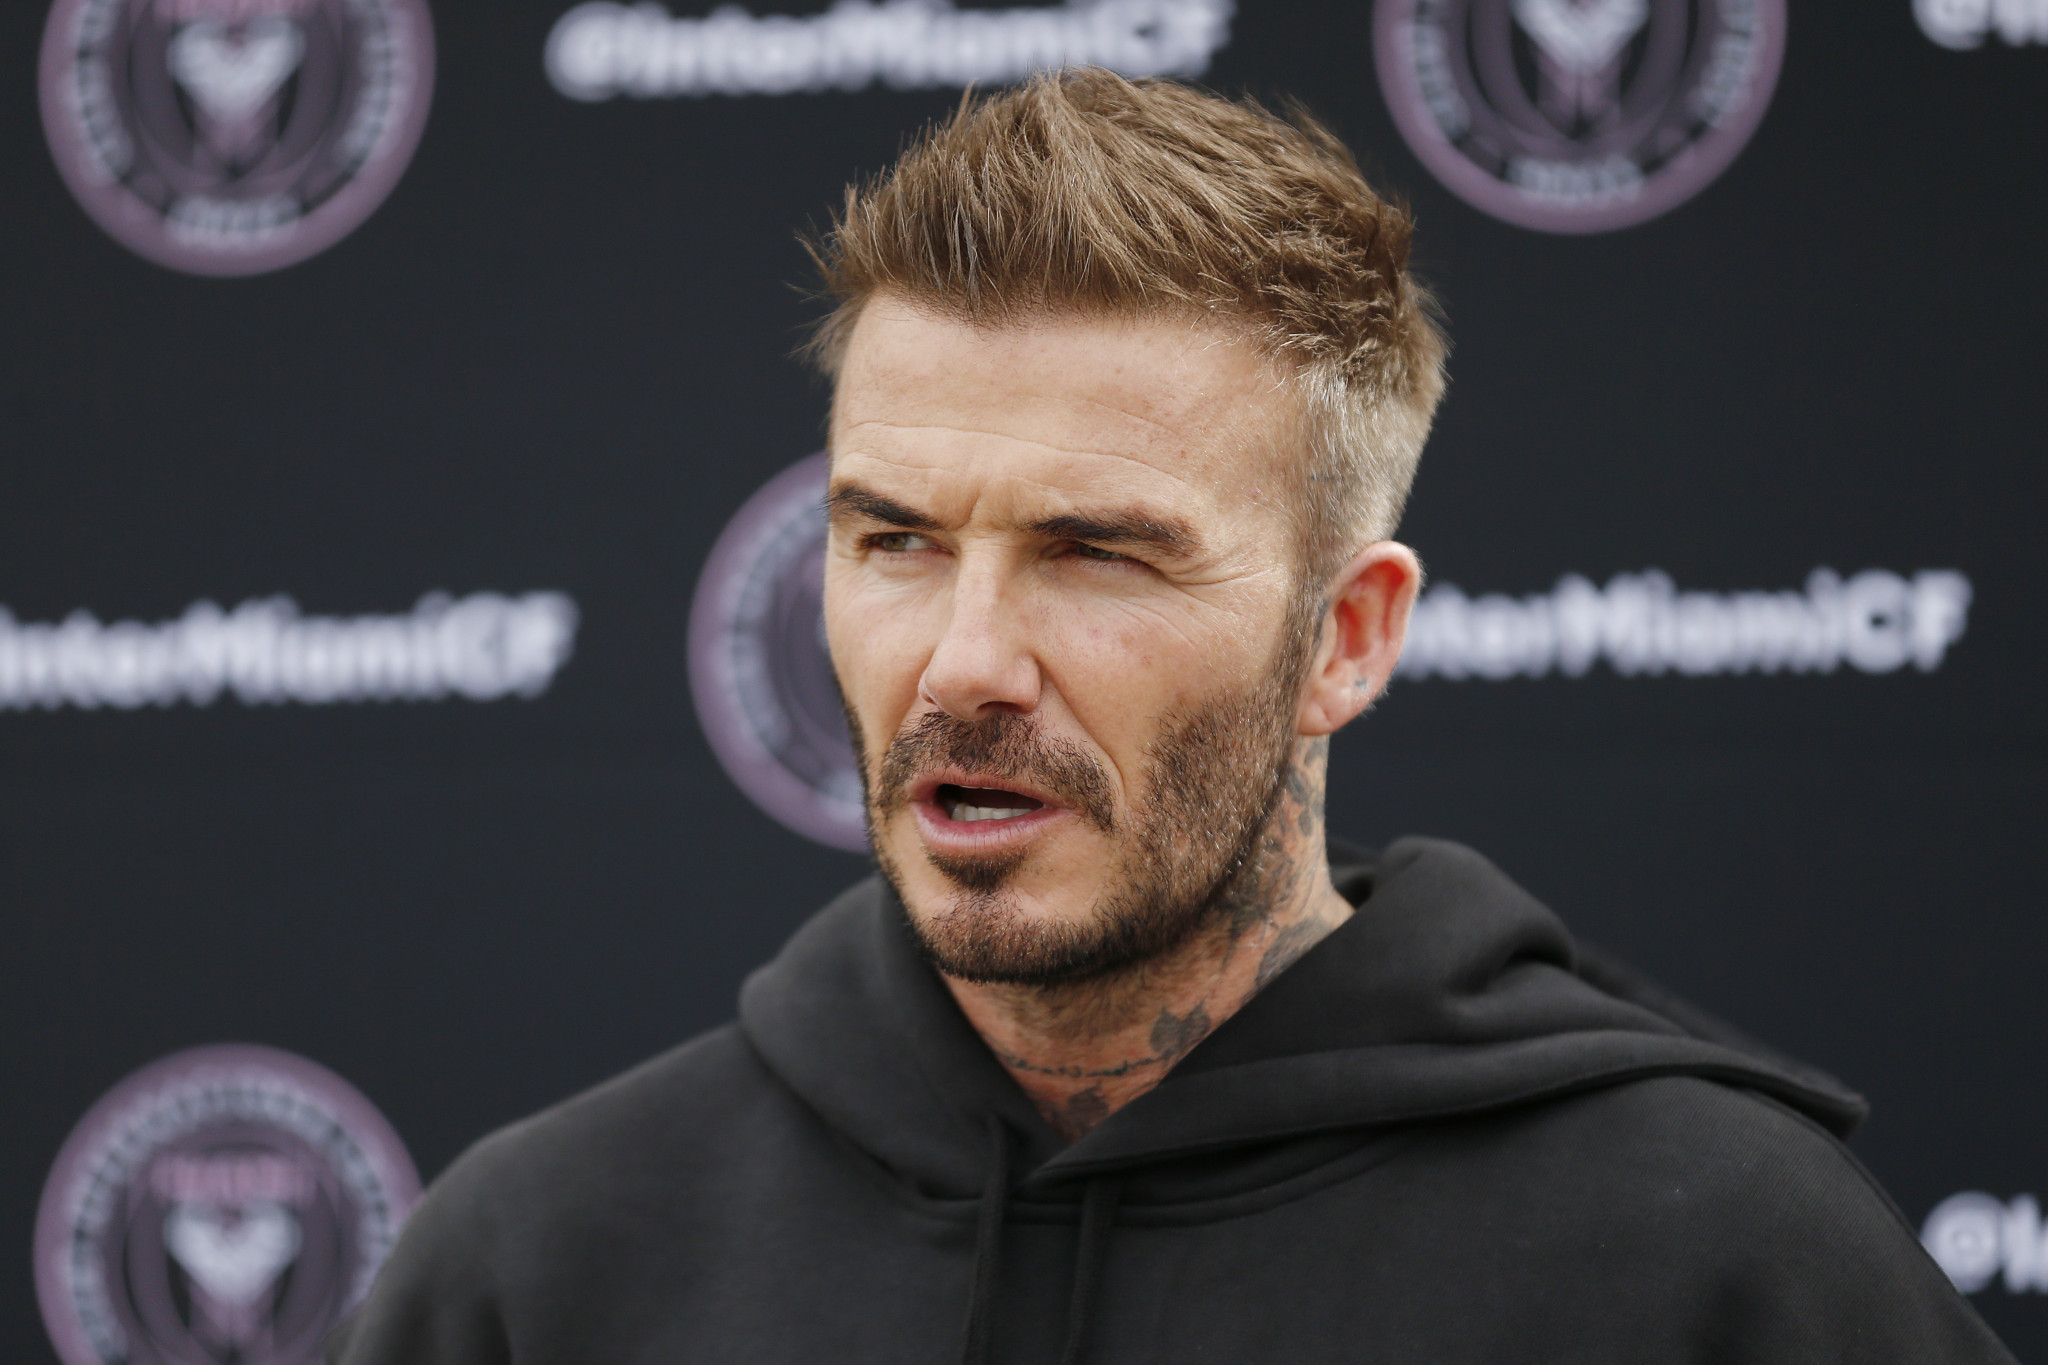 Beckham's esports organisation to enter Rocket League